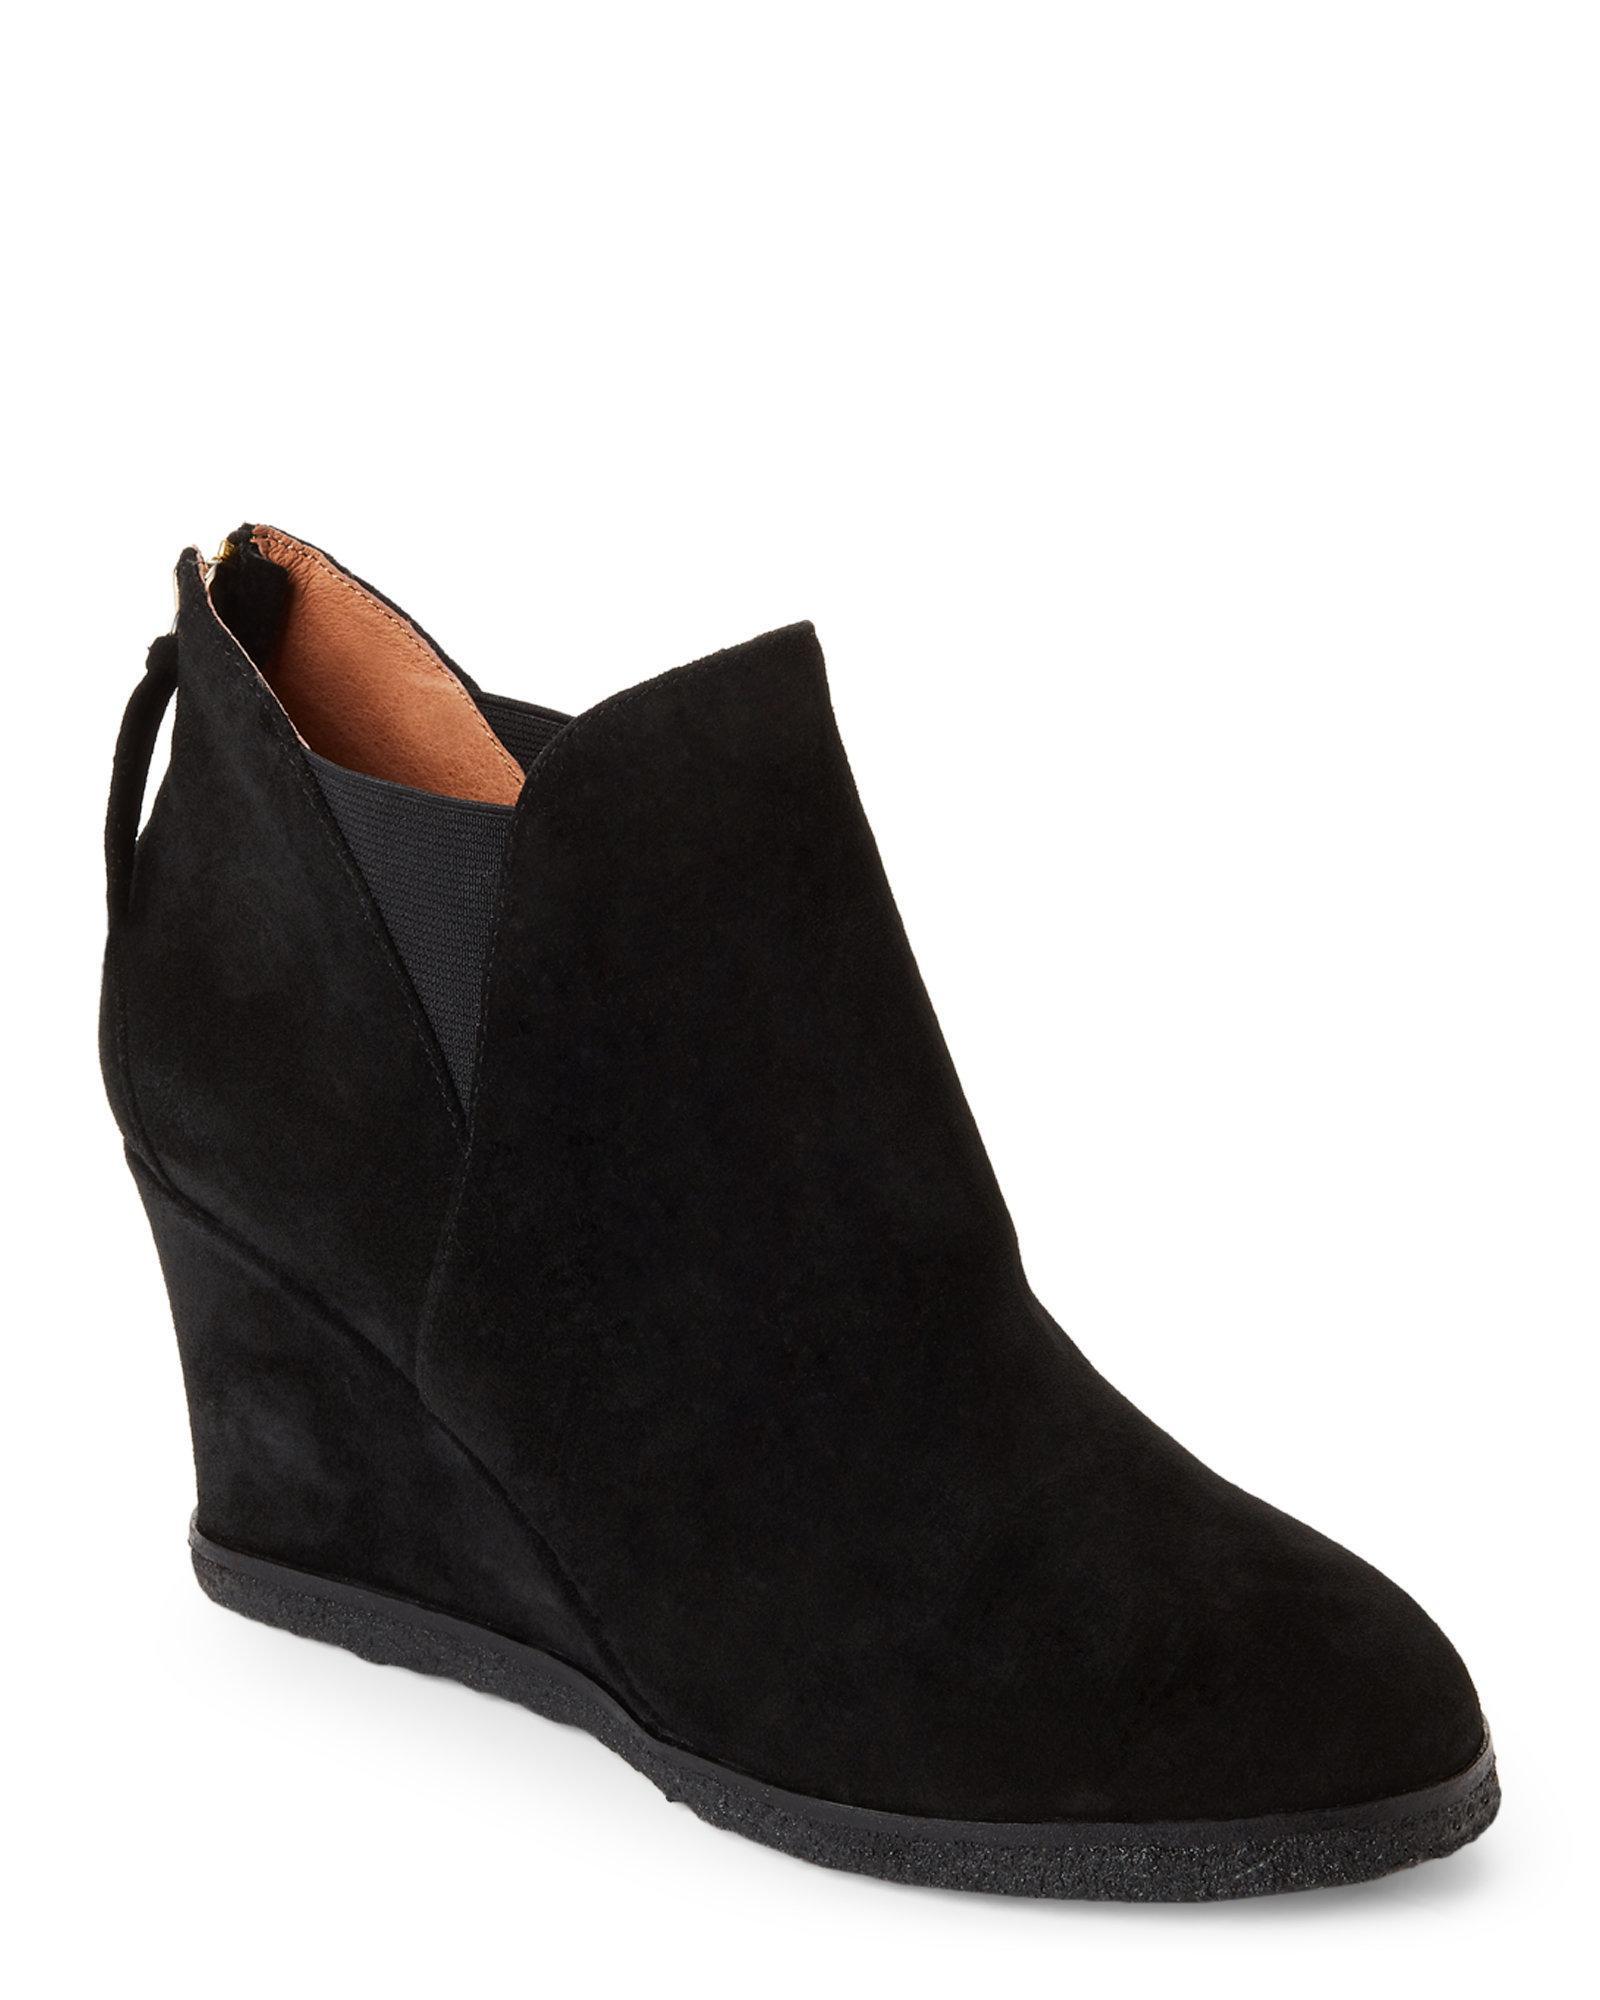 9478b143459 Lyst - Bettye By Bettye Muller Black Zap Wedge Booties in Black